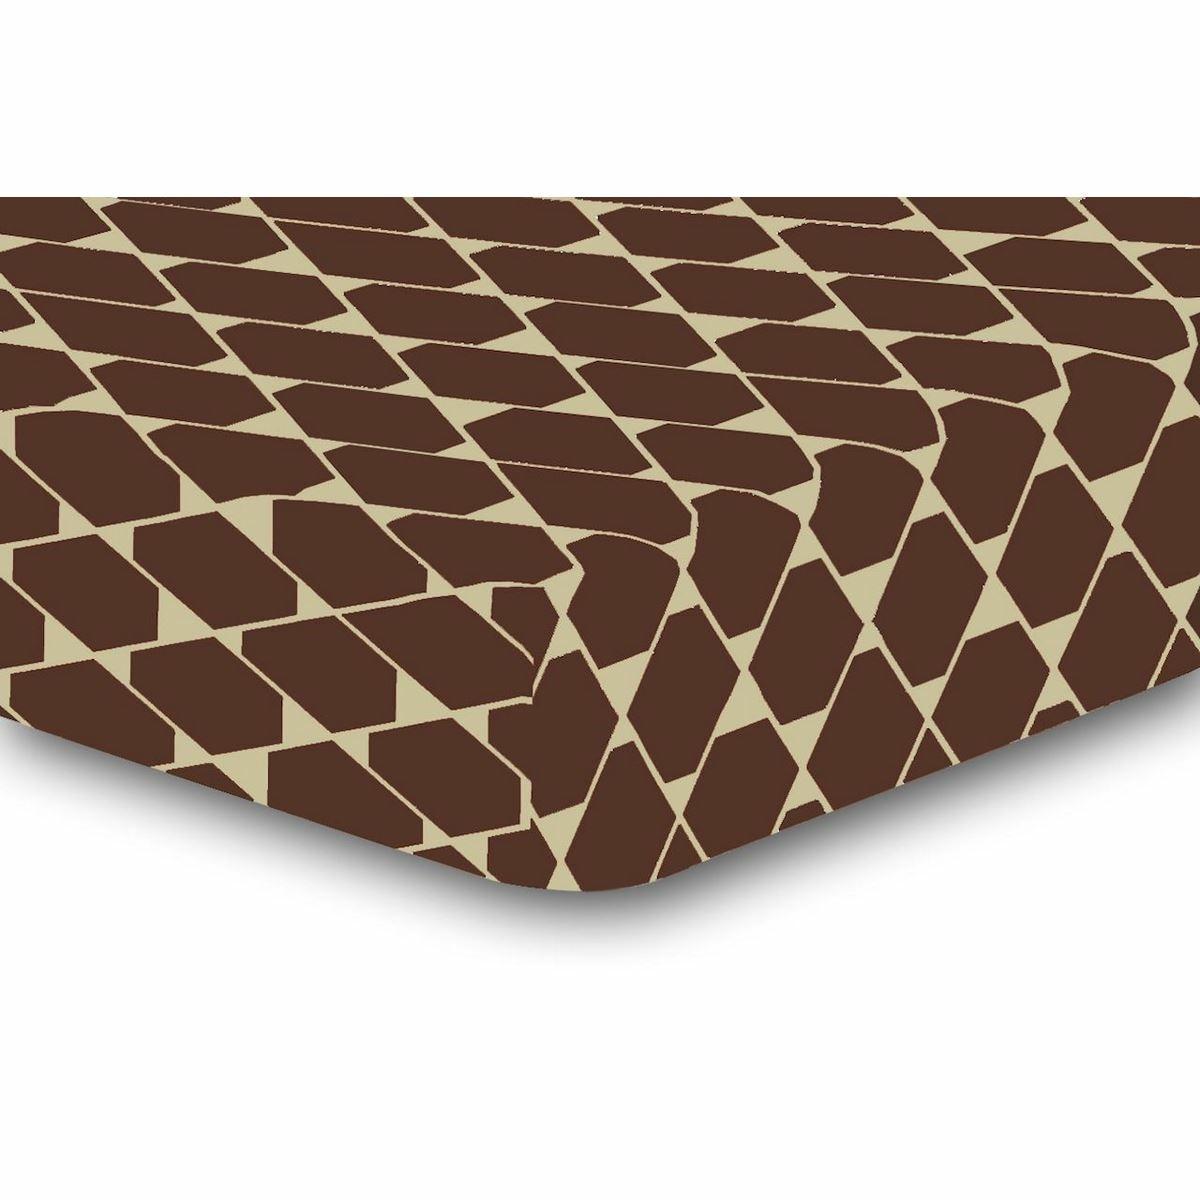 DecoKing Prostěradlo Rhombuses hnědý S2, 160 x 200 cm